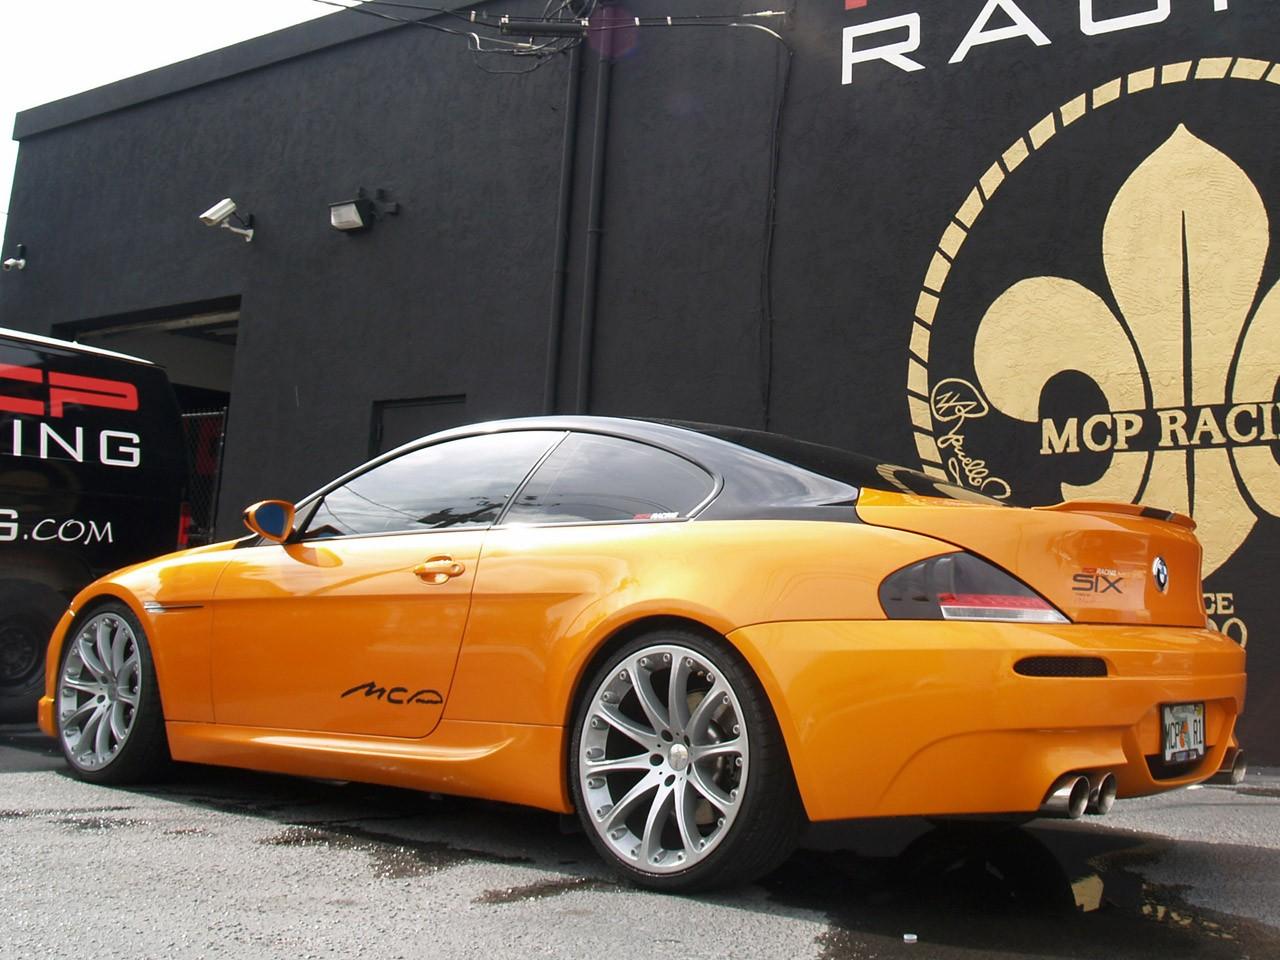 2009 MCP Racing - Bmw M6 Coupe E63